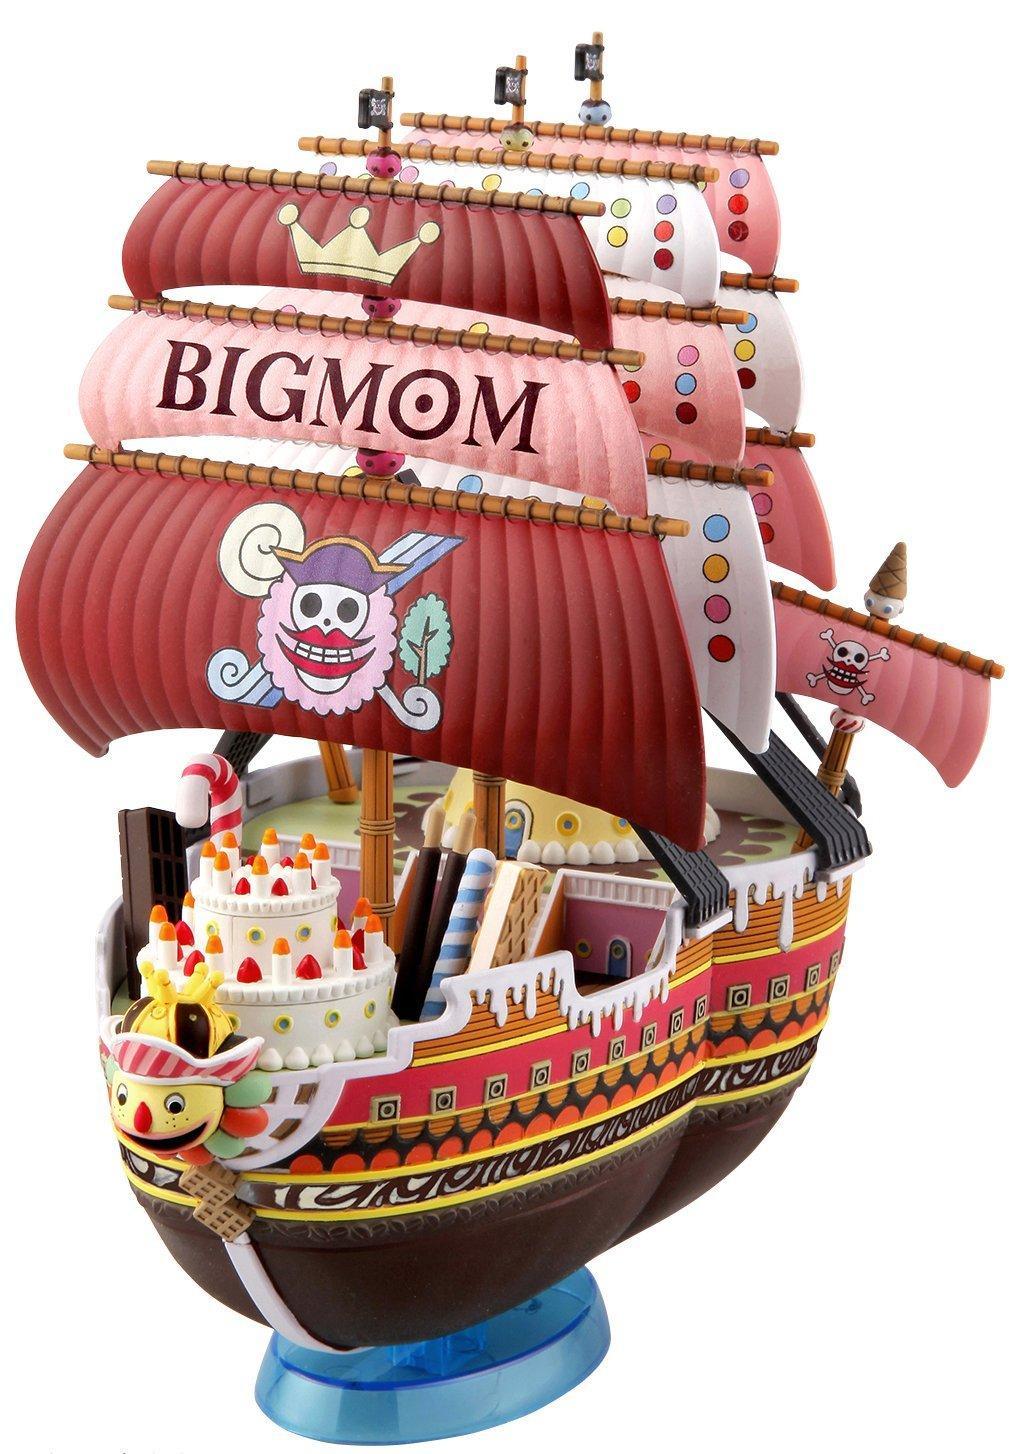 ONE PIECE - Model Kit - Ship - Queen Mama Chanter - 15 CM_1